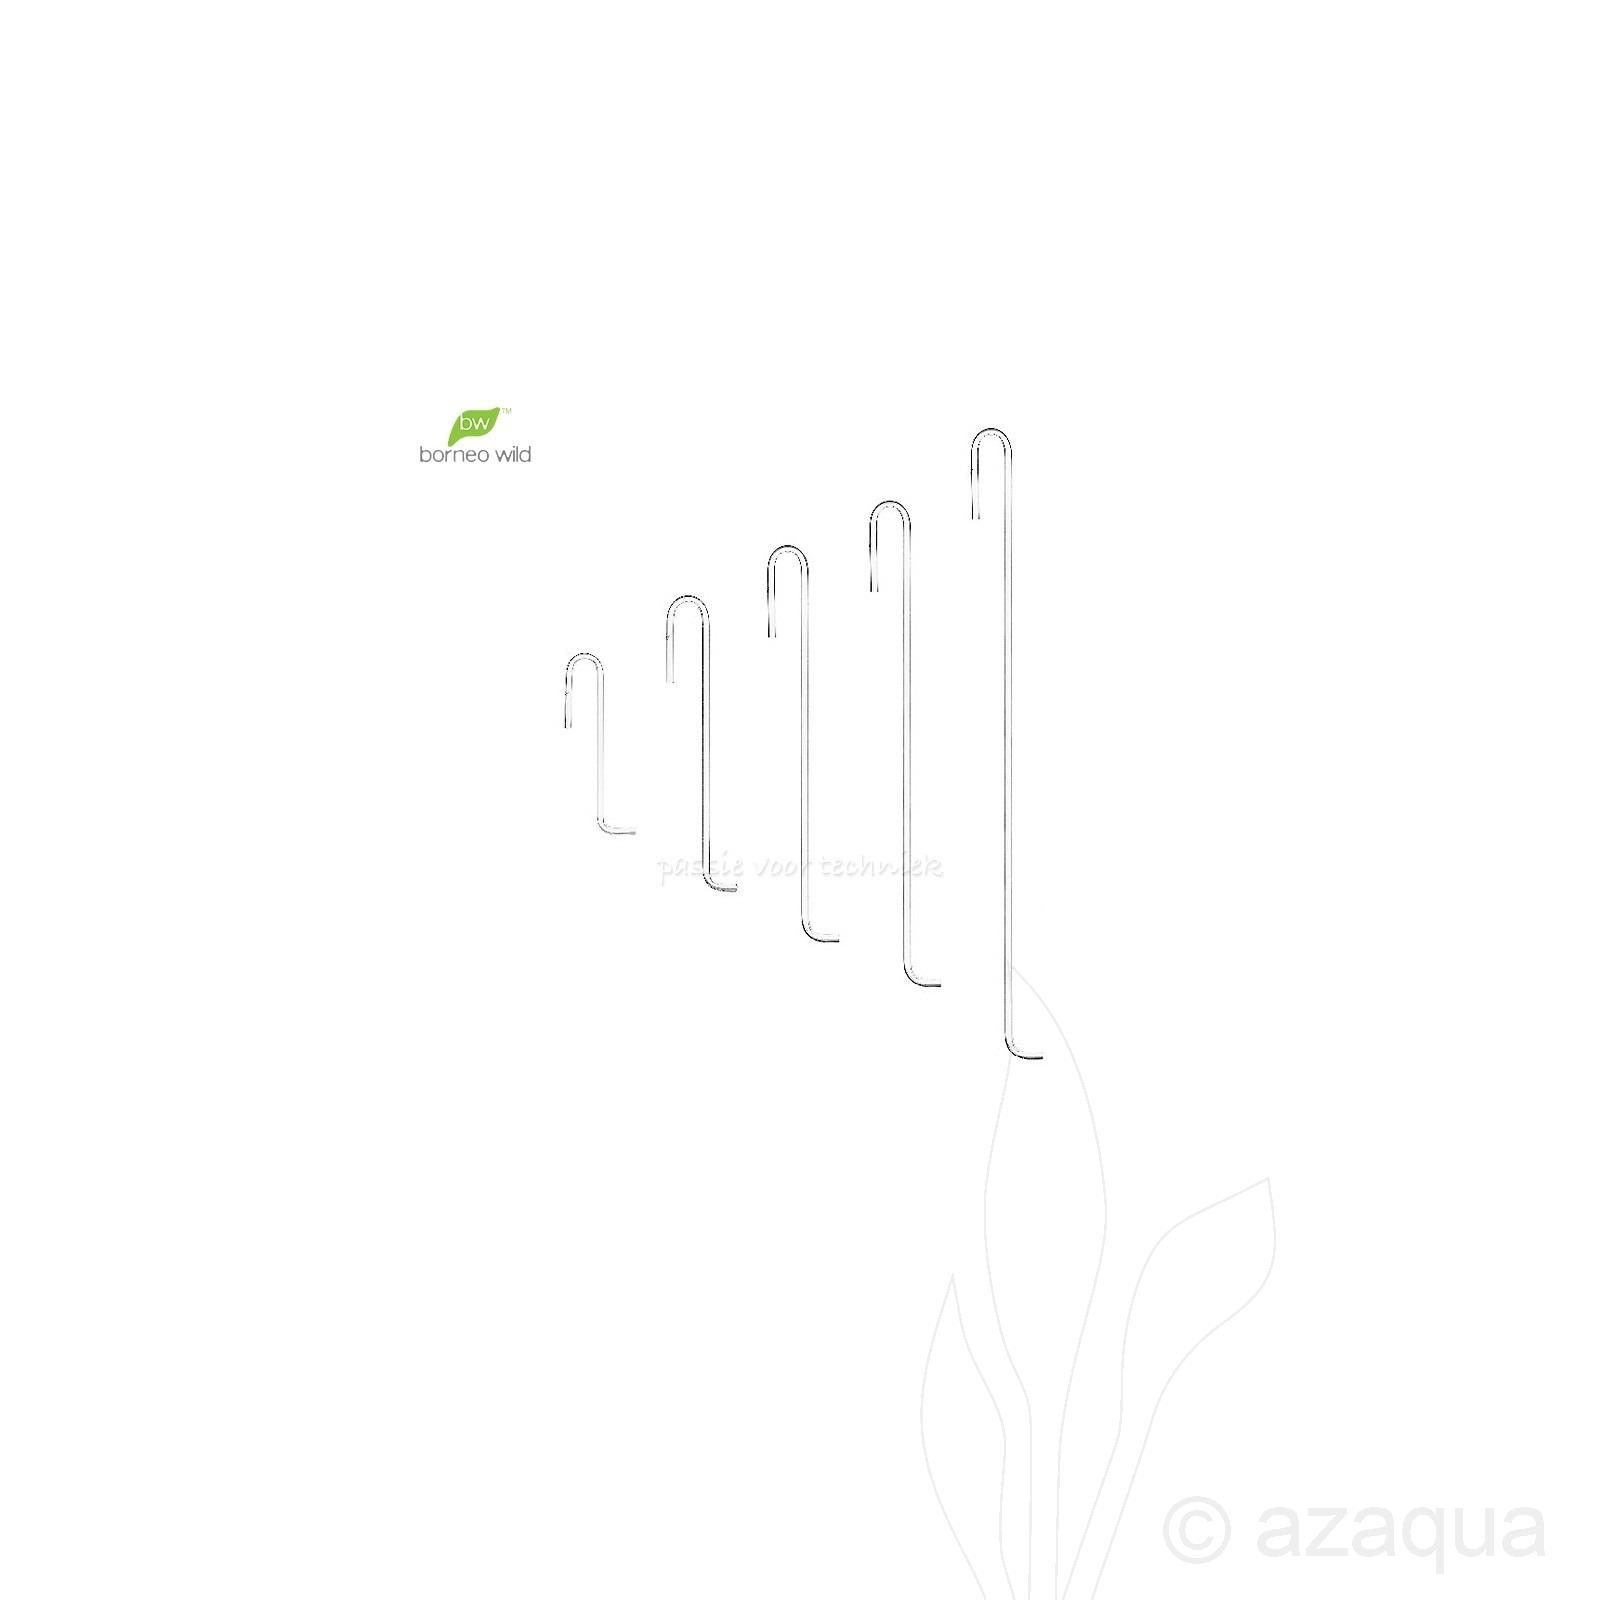 Borneowild CO2 Glass (JL series)